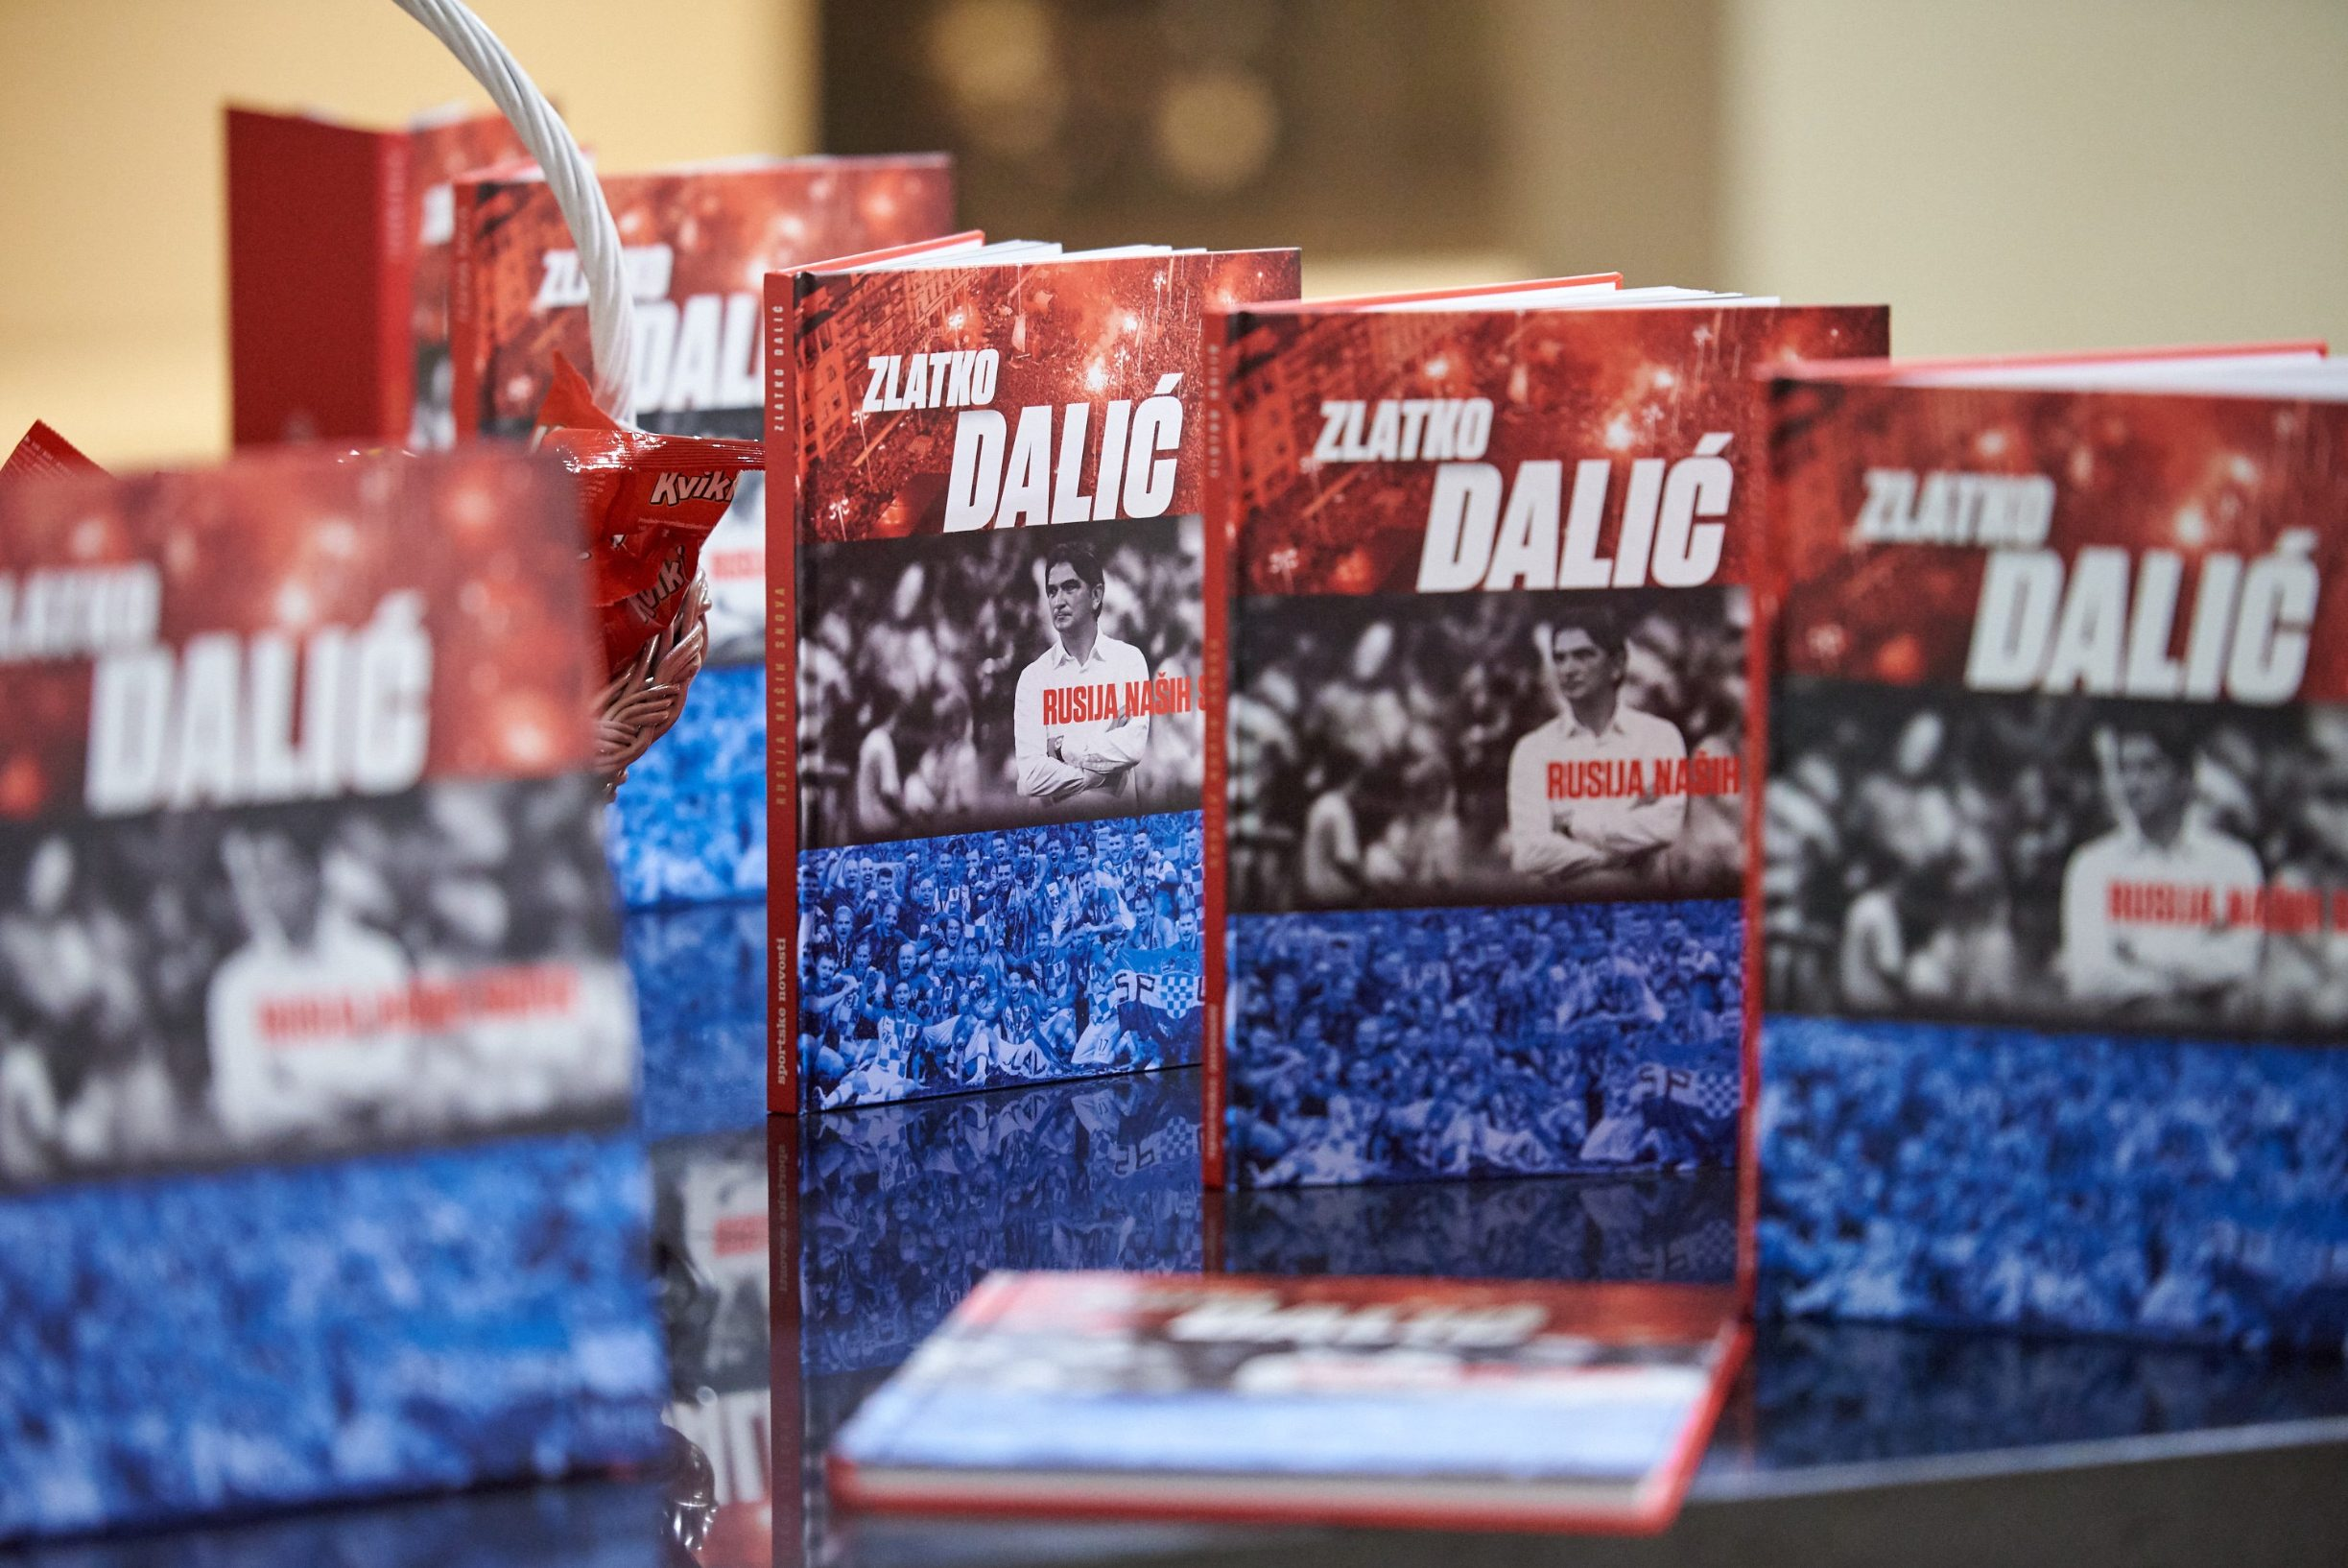 Dubrovnik, 020419. Hotel Rixos Libertas Promocija knjige Rusija nasih snova Zlatka Dalica. Na fotografiji: knjiga Foto: Tonci Plazibat / CROPIX